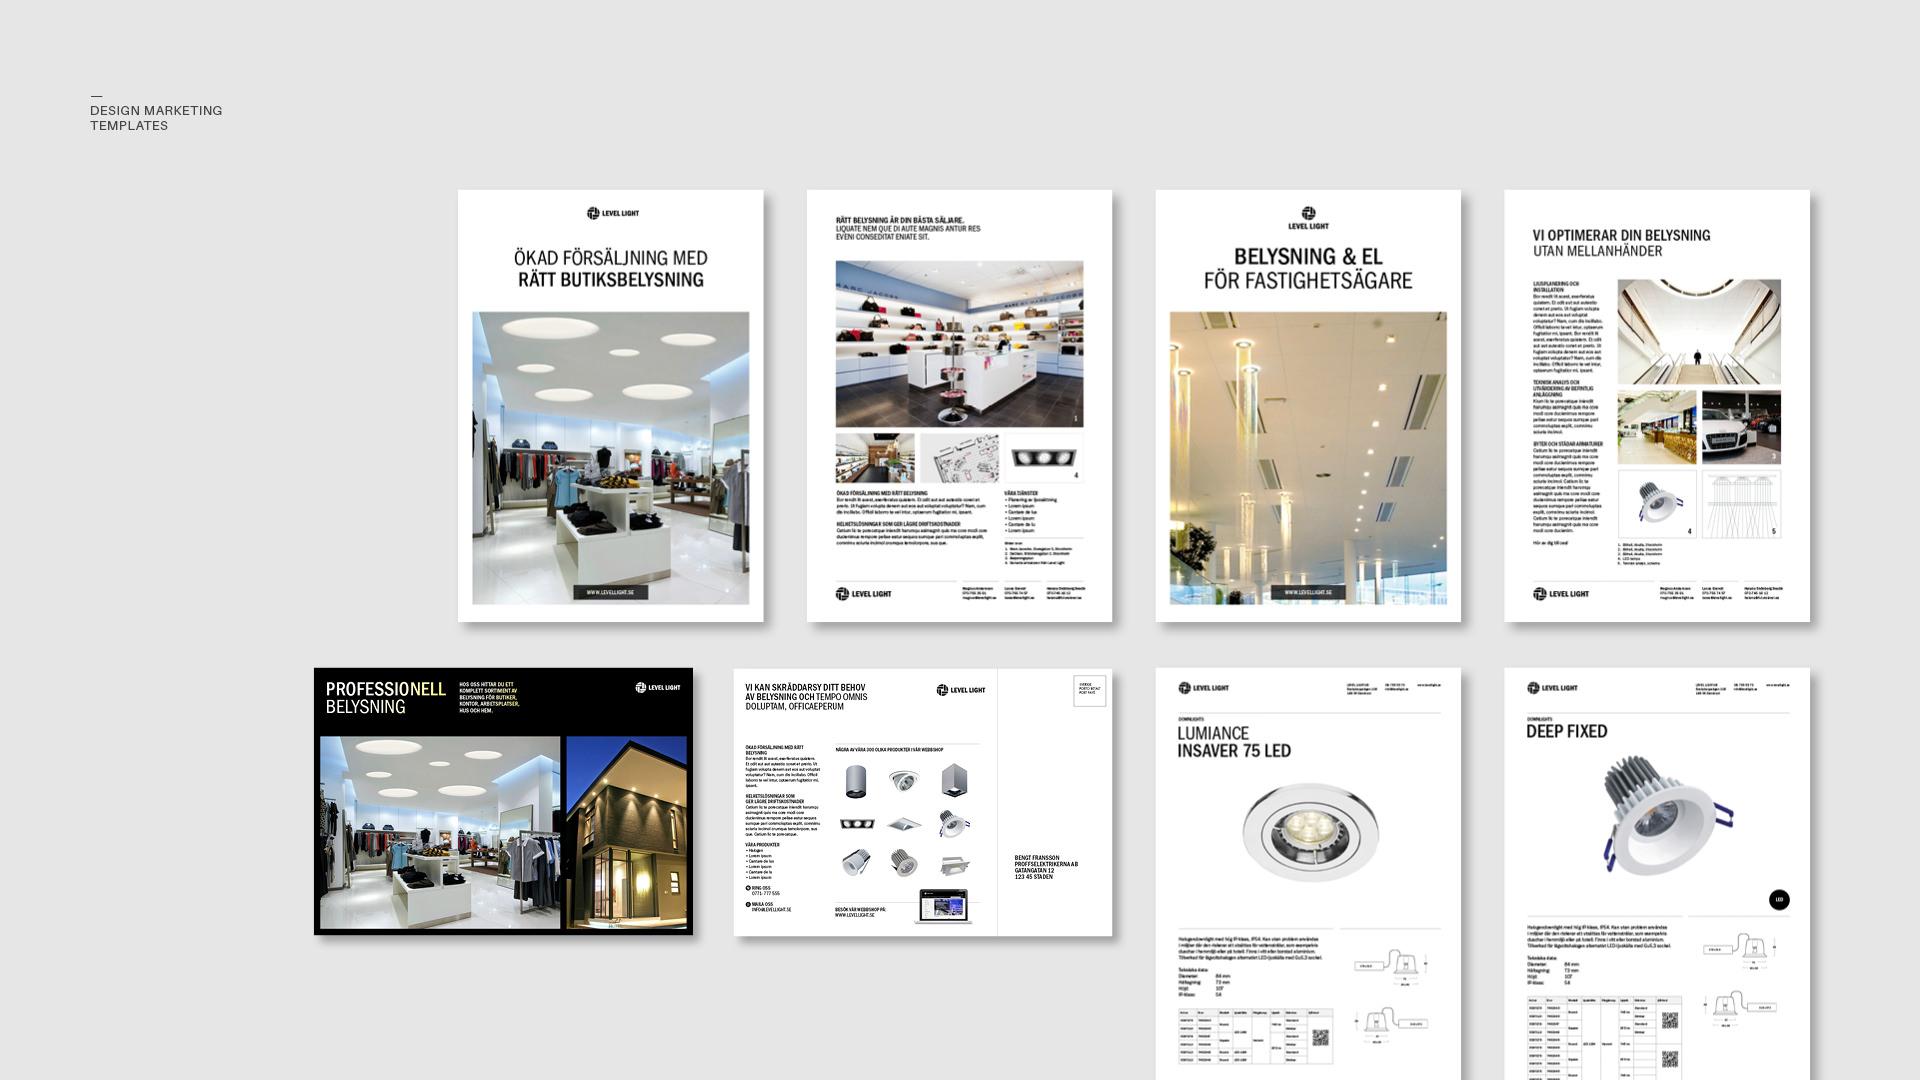 levellight-logotype-marketing-templates